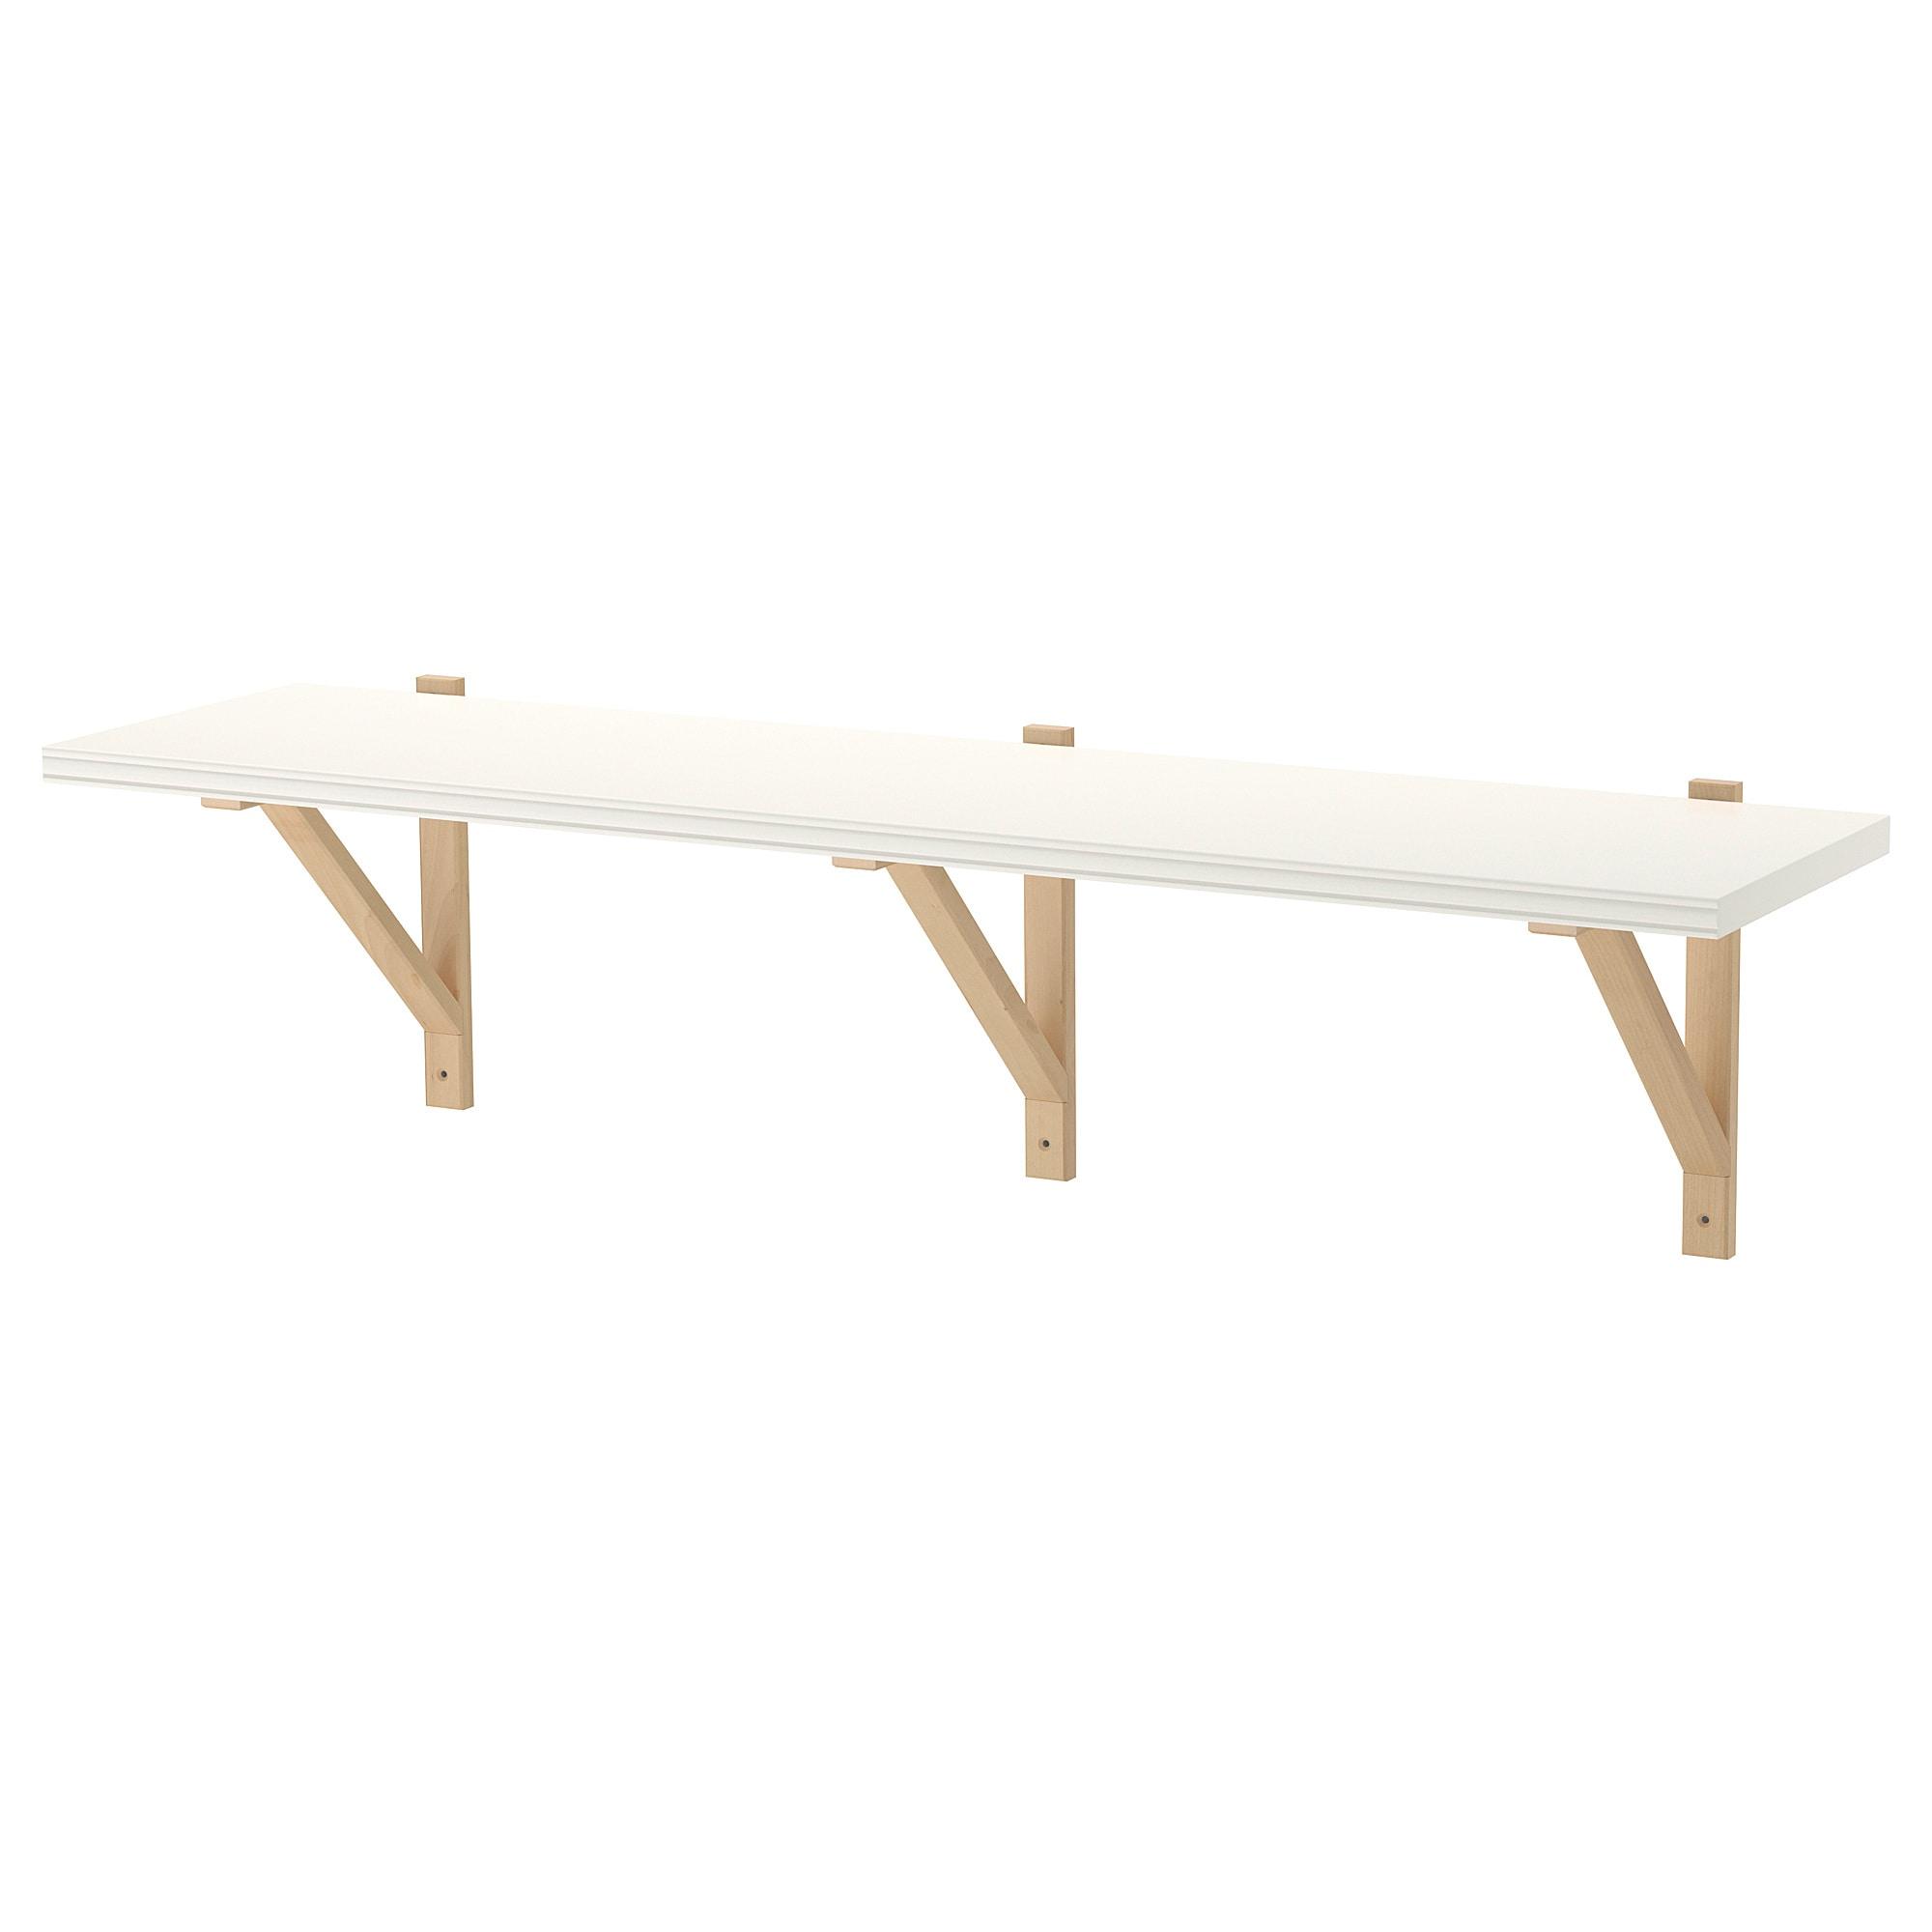 Ikea Us Furniture And Home Furnishings Wall Shelves Ikea Solid Wood Shelves